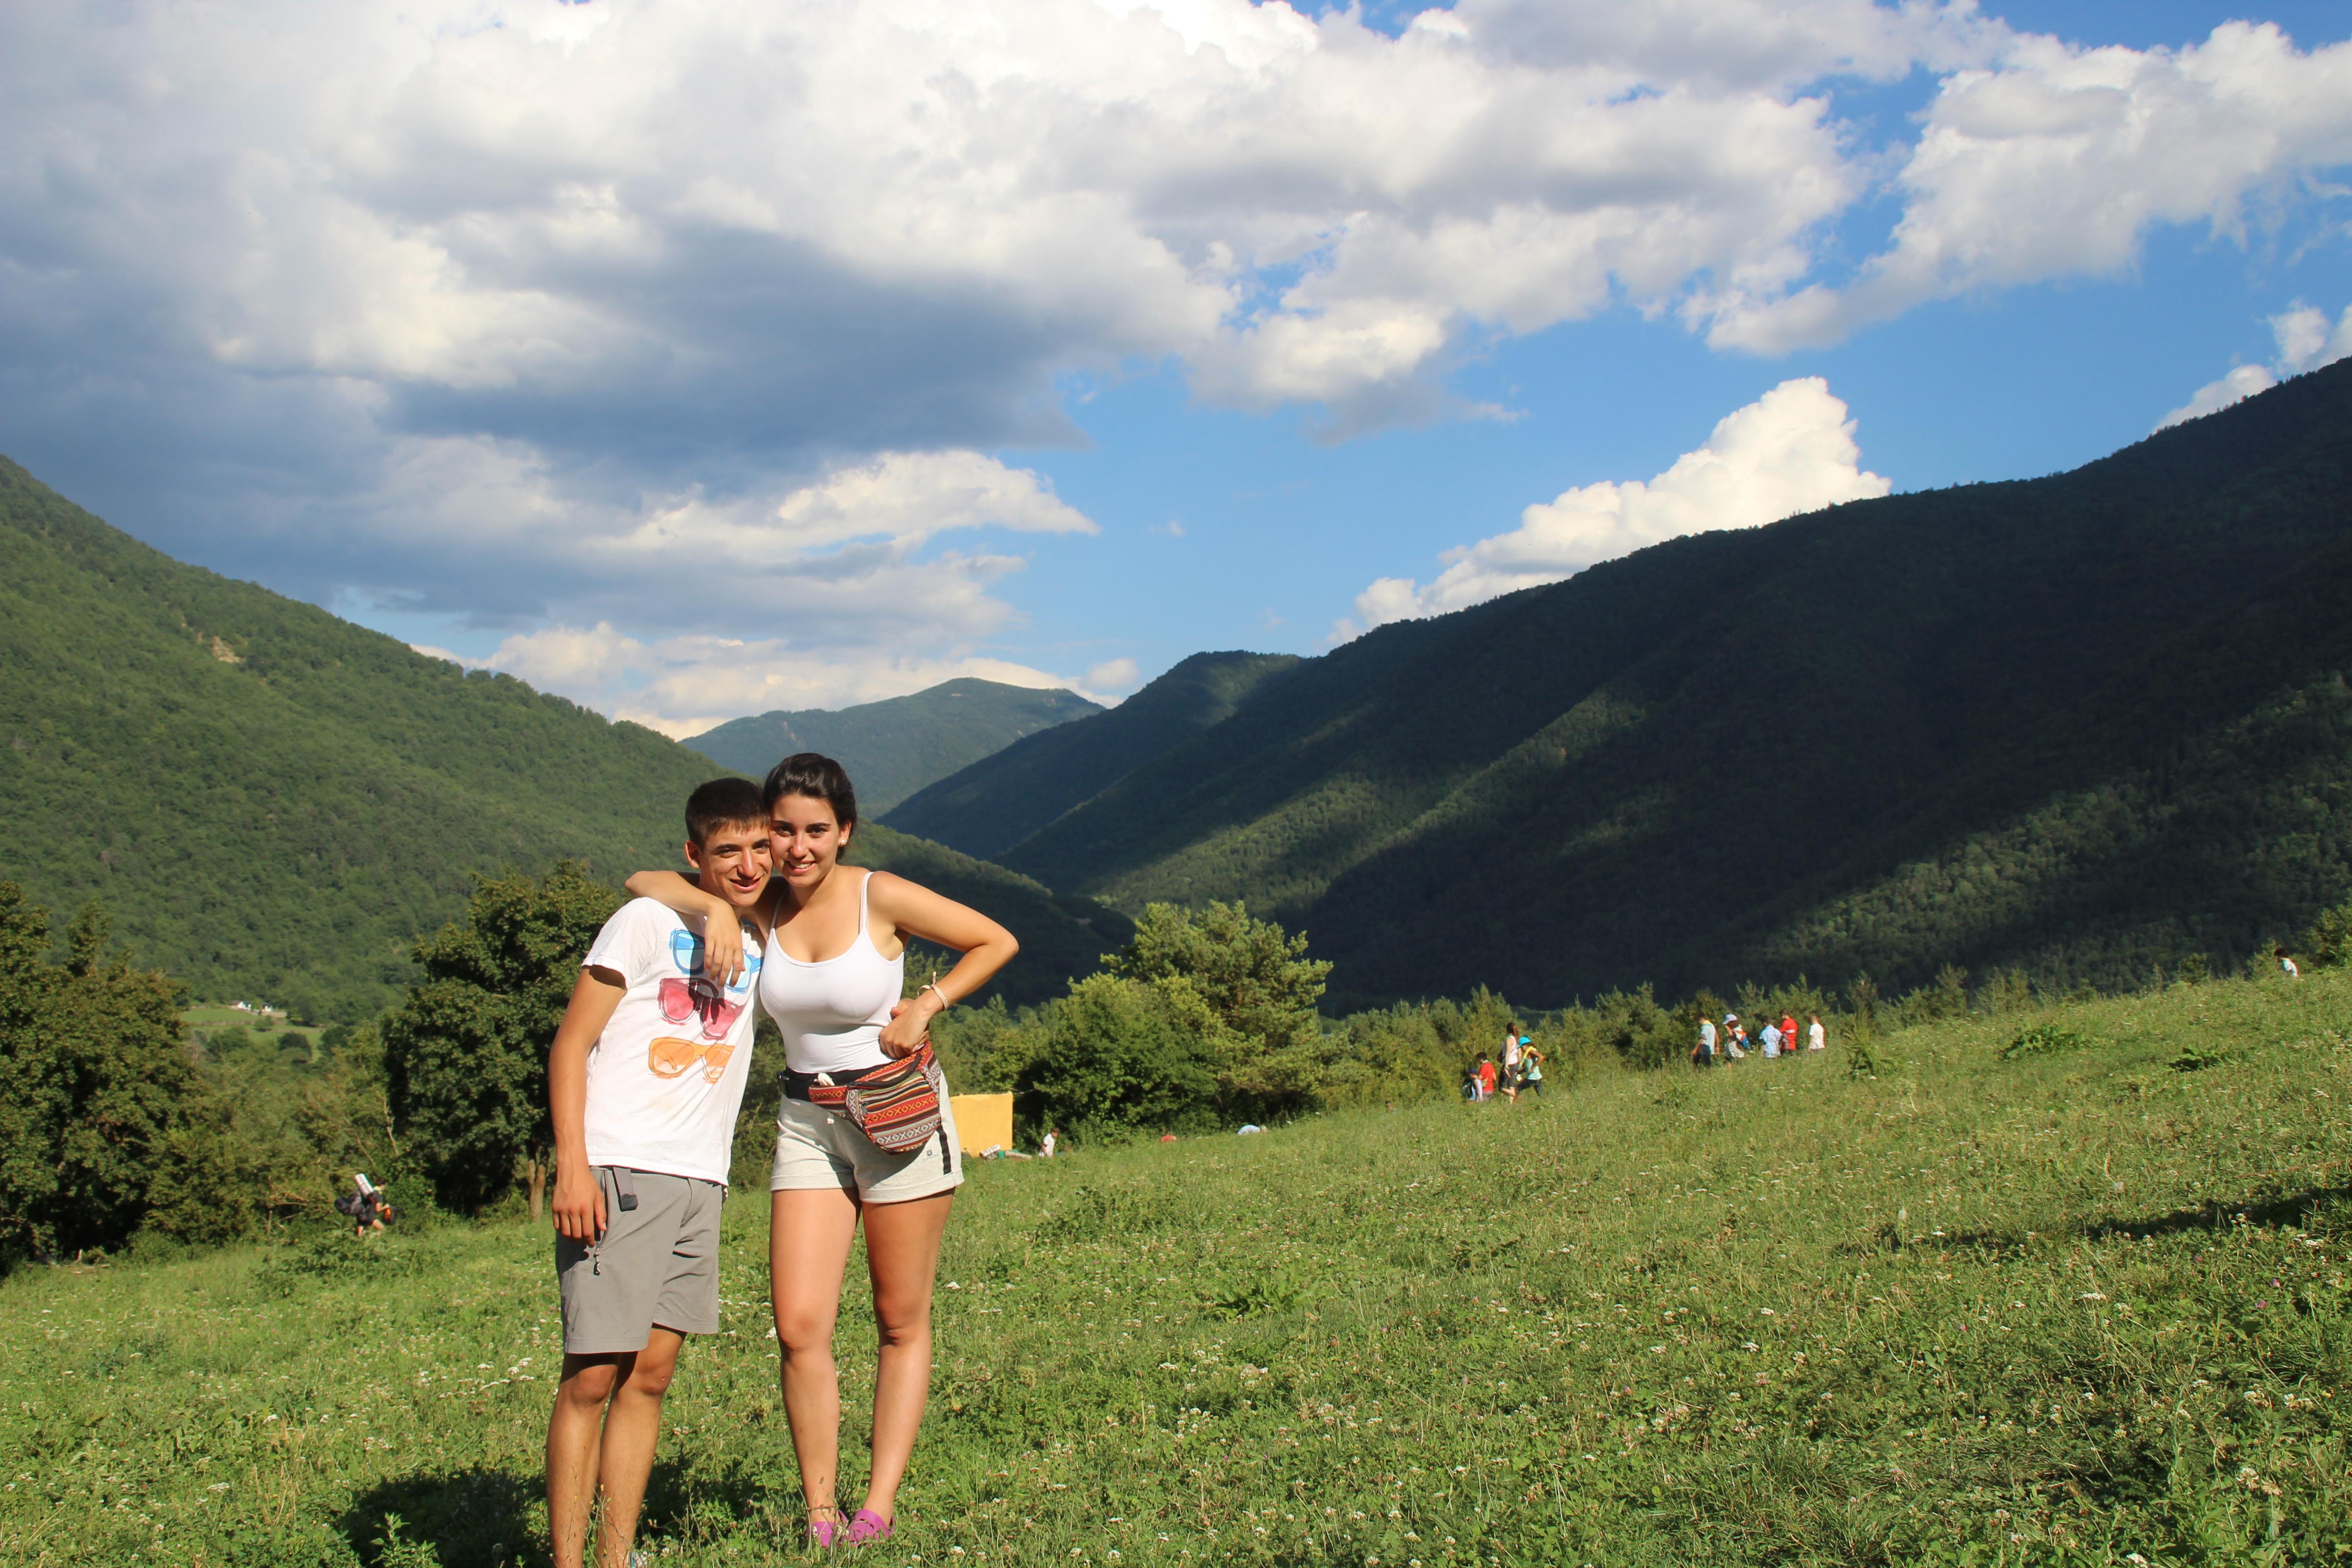 15-16 - Grupo - Campamento de verano - P239